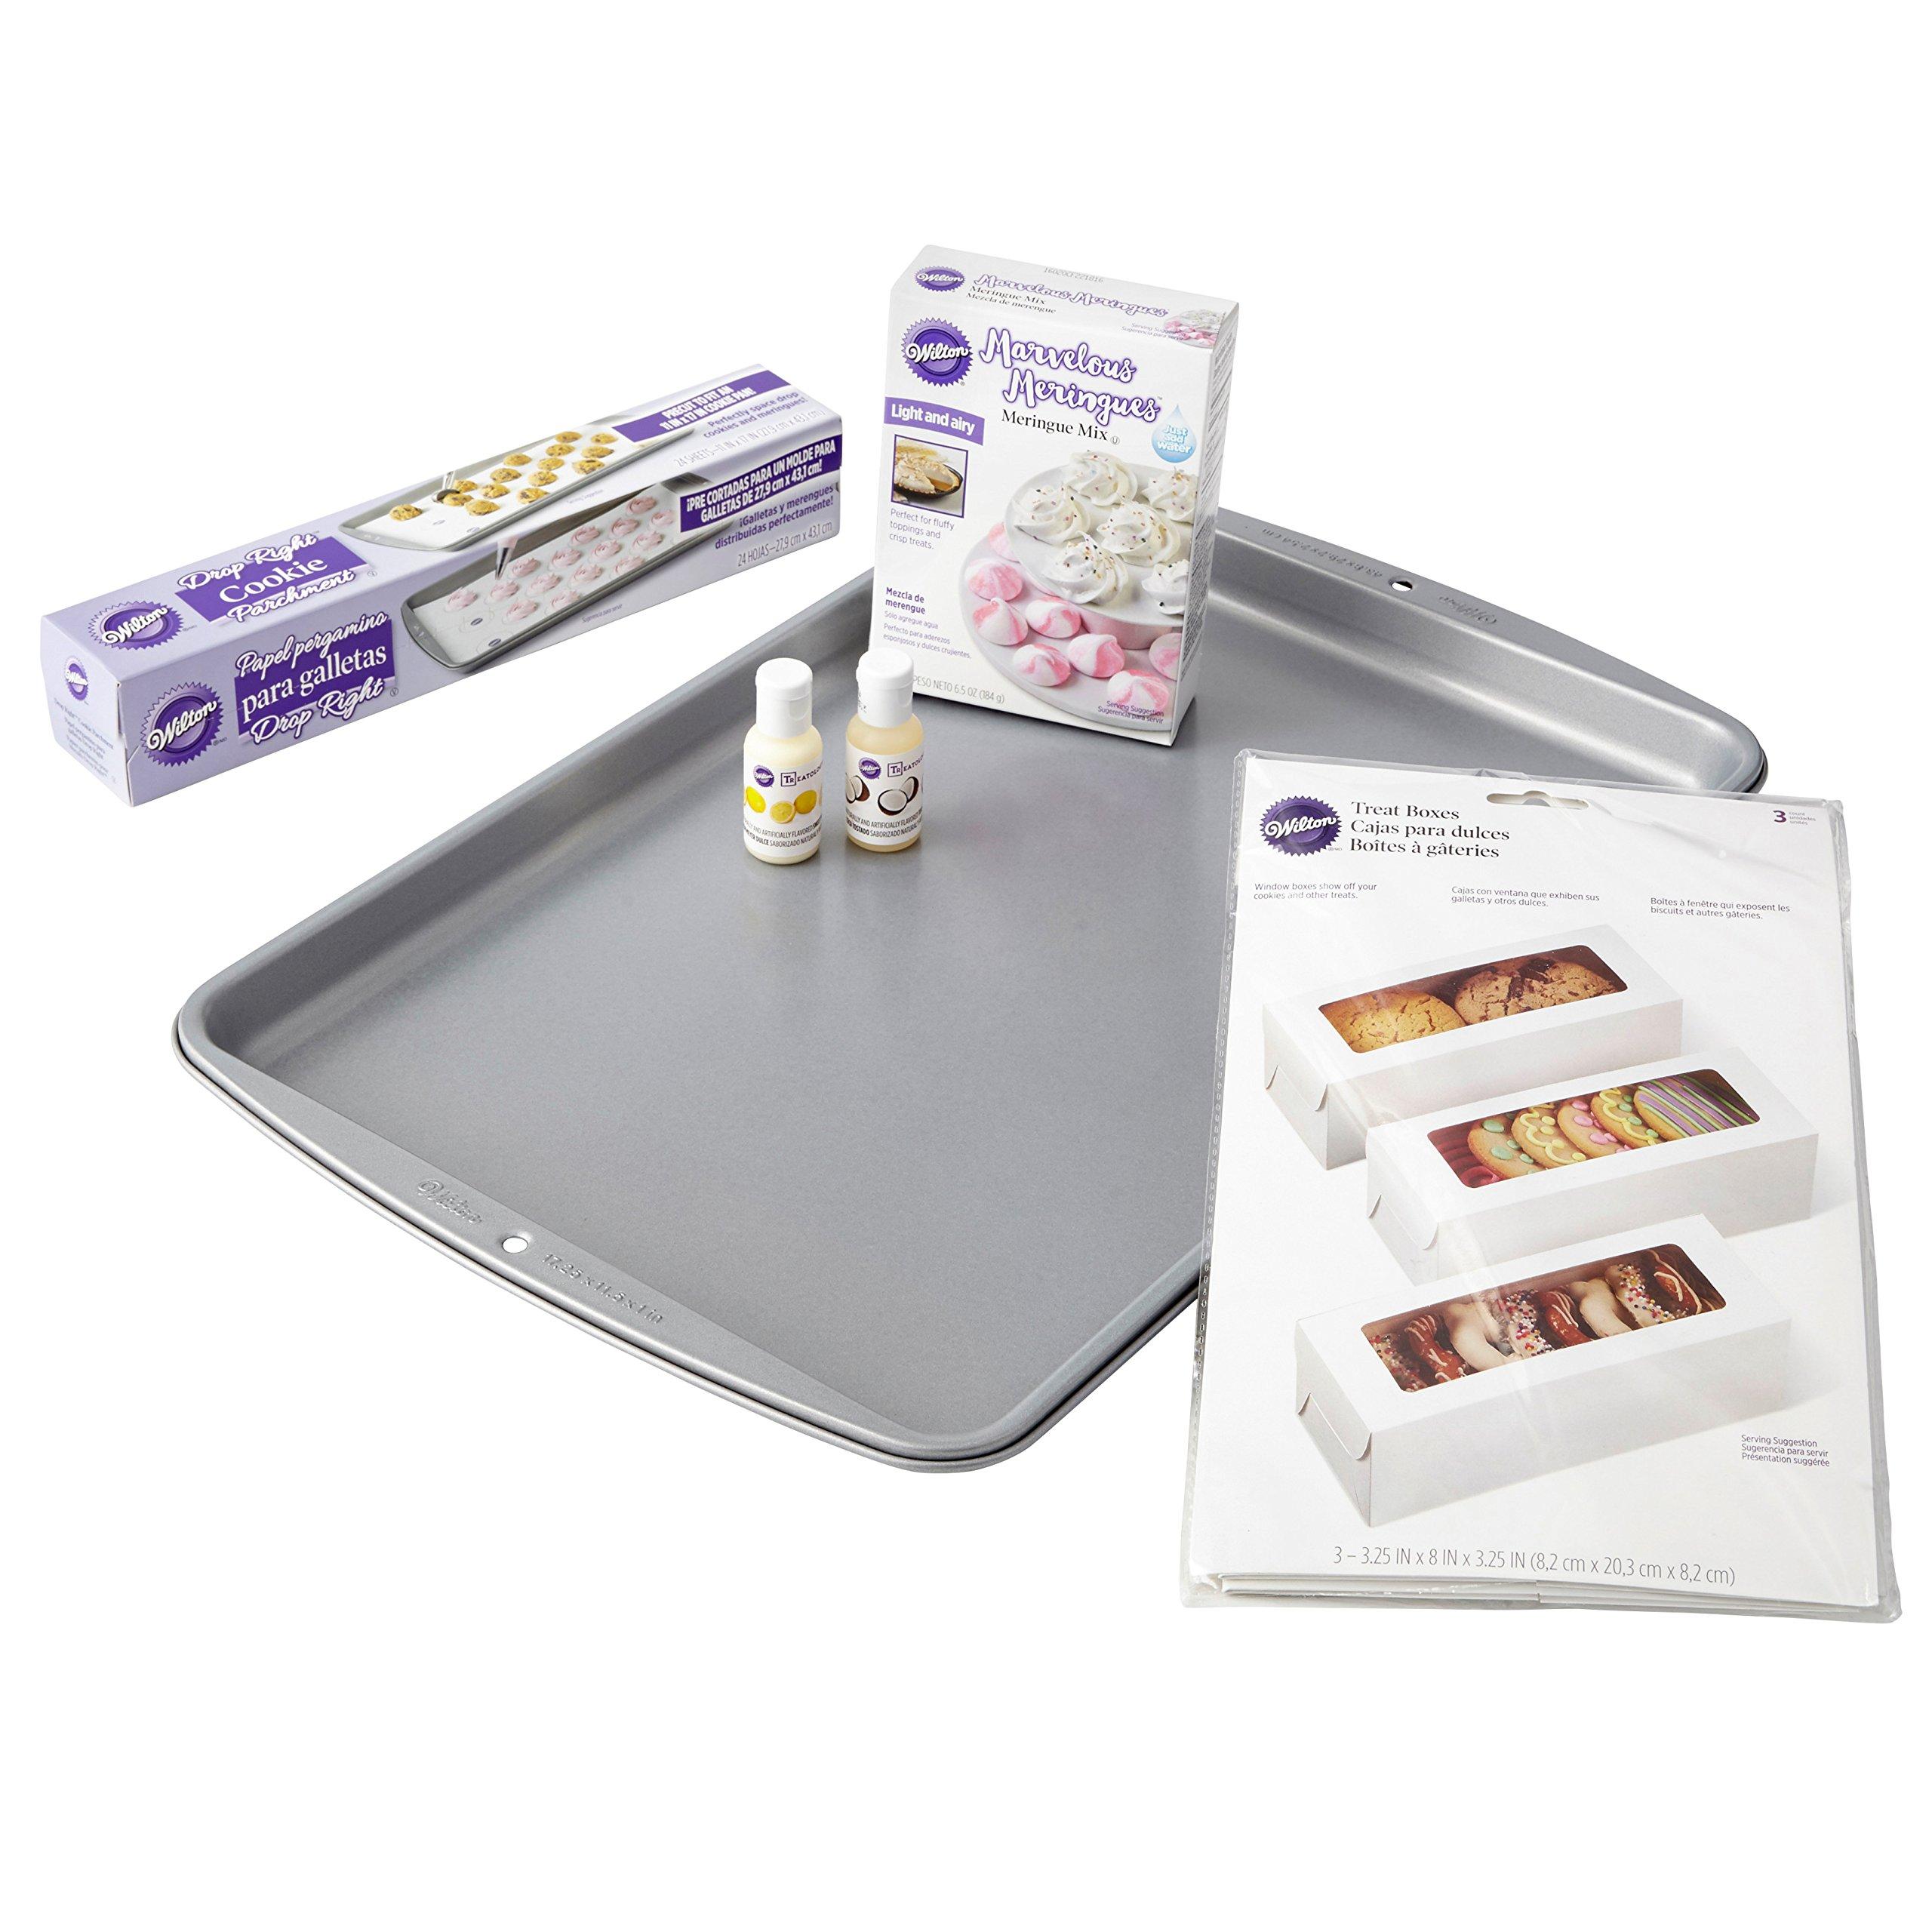 Wilton 2109-8423 Meringue Ingredients and Supplies Cookie Kit Baking Bundle, Assorted